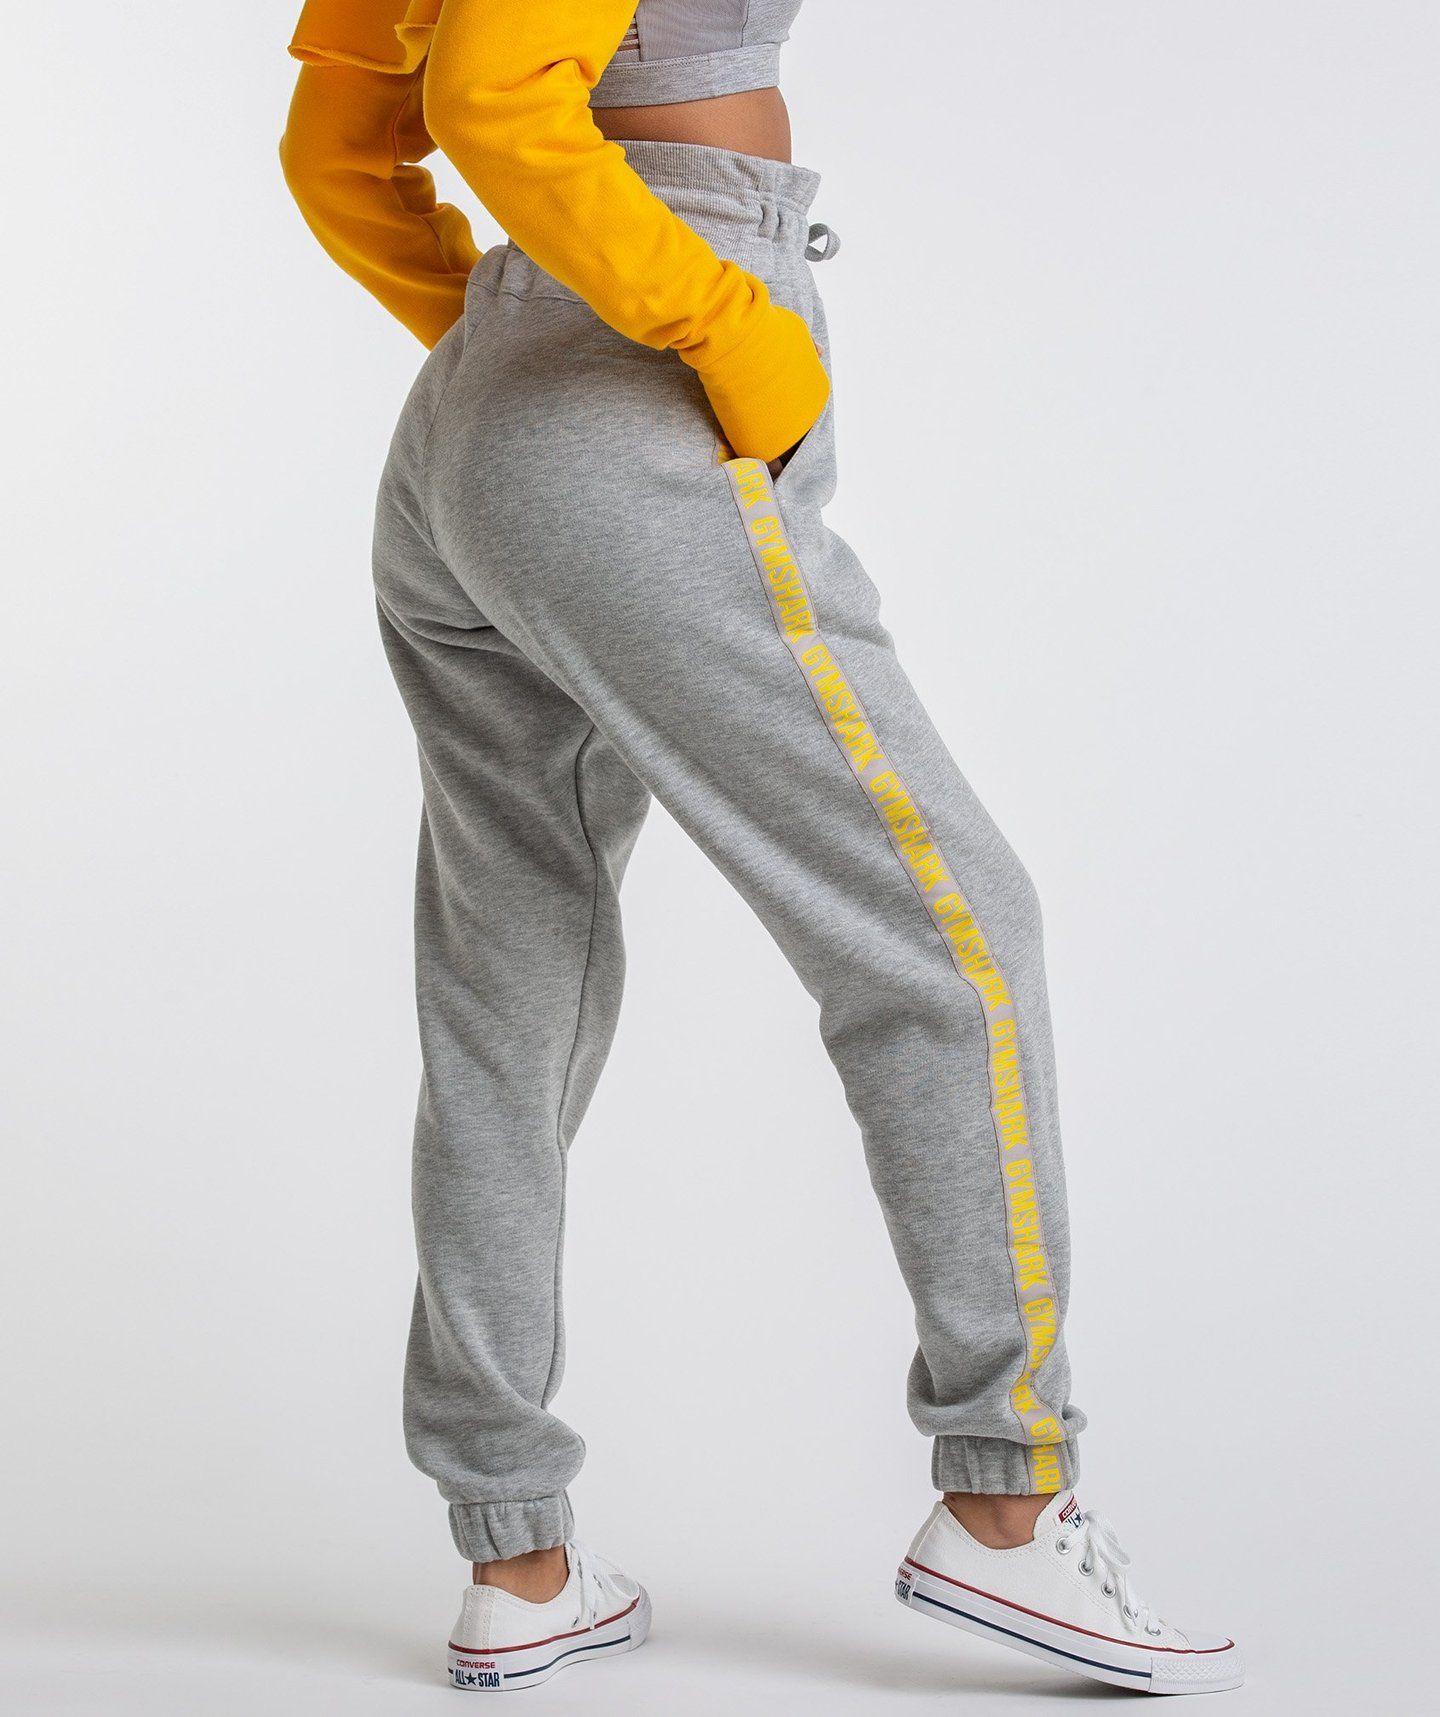 a7aae4641d Gymshark Oversized Joggers - Light Grey Marl 1. Gymshark Oversized Joggers  - Light Grey Marl 1 Workout Pants ...